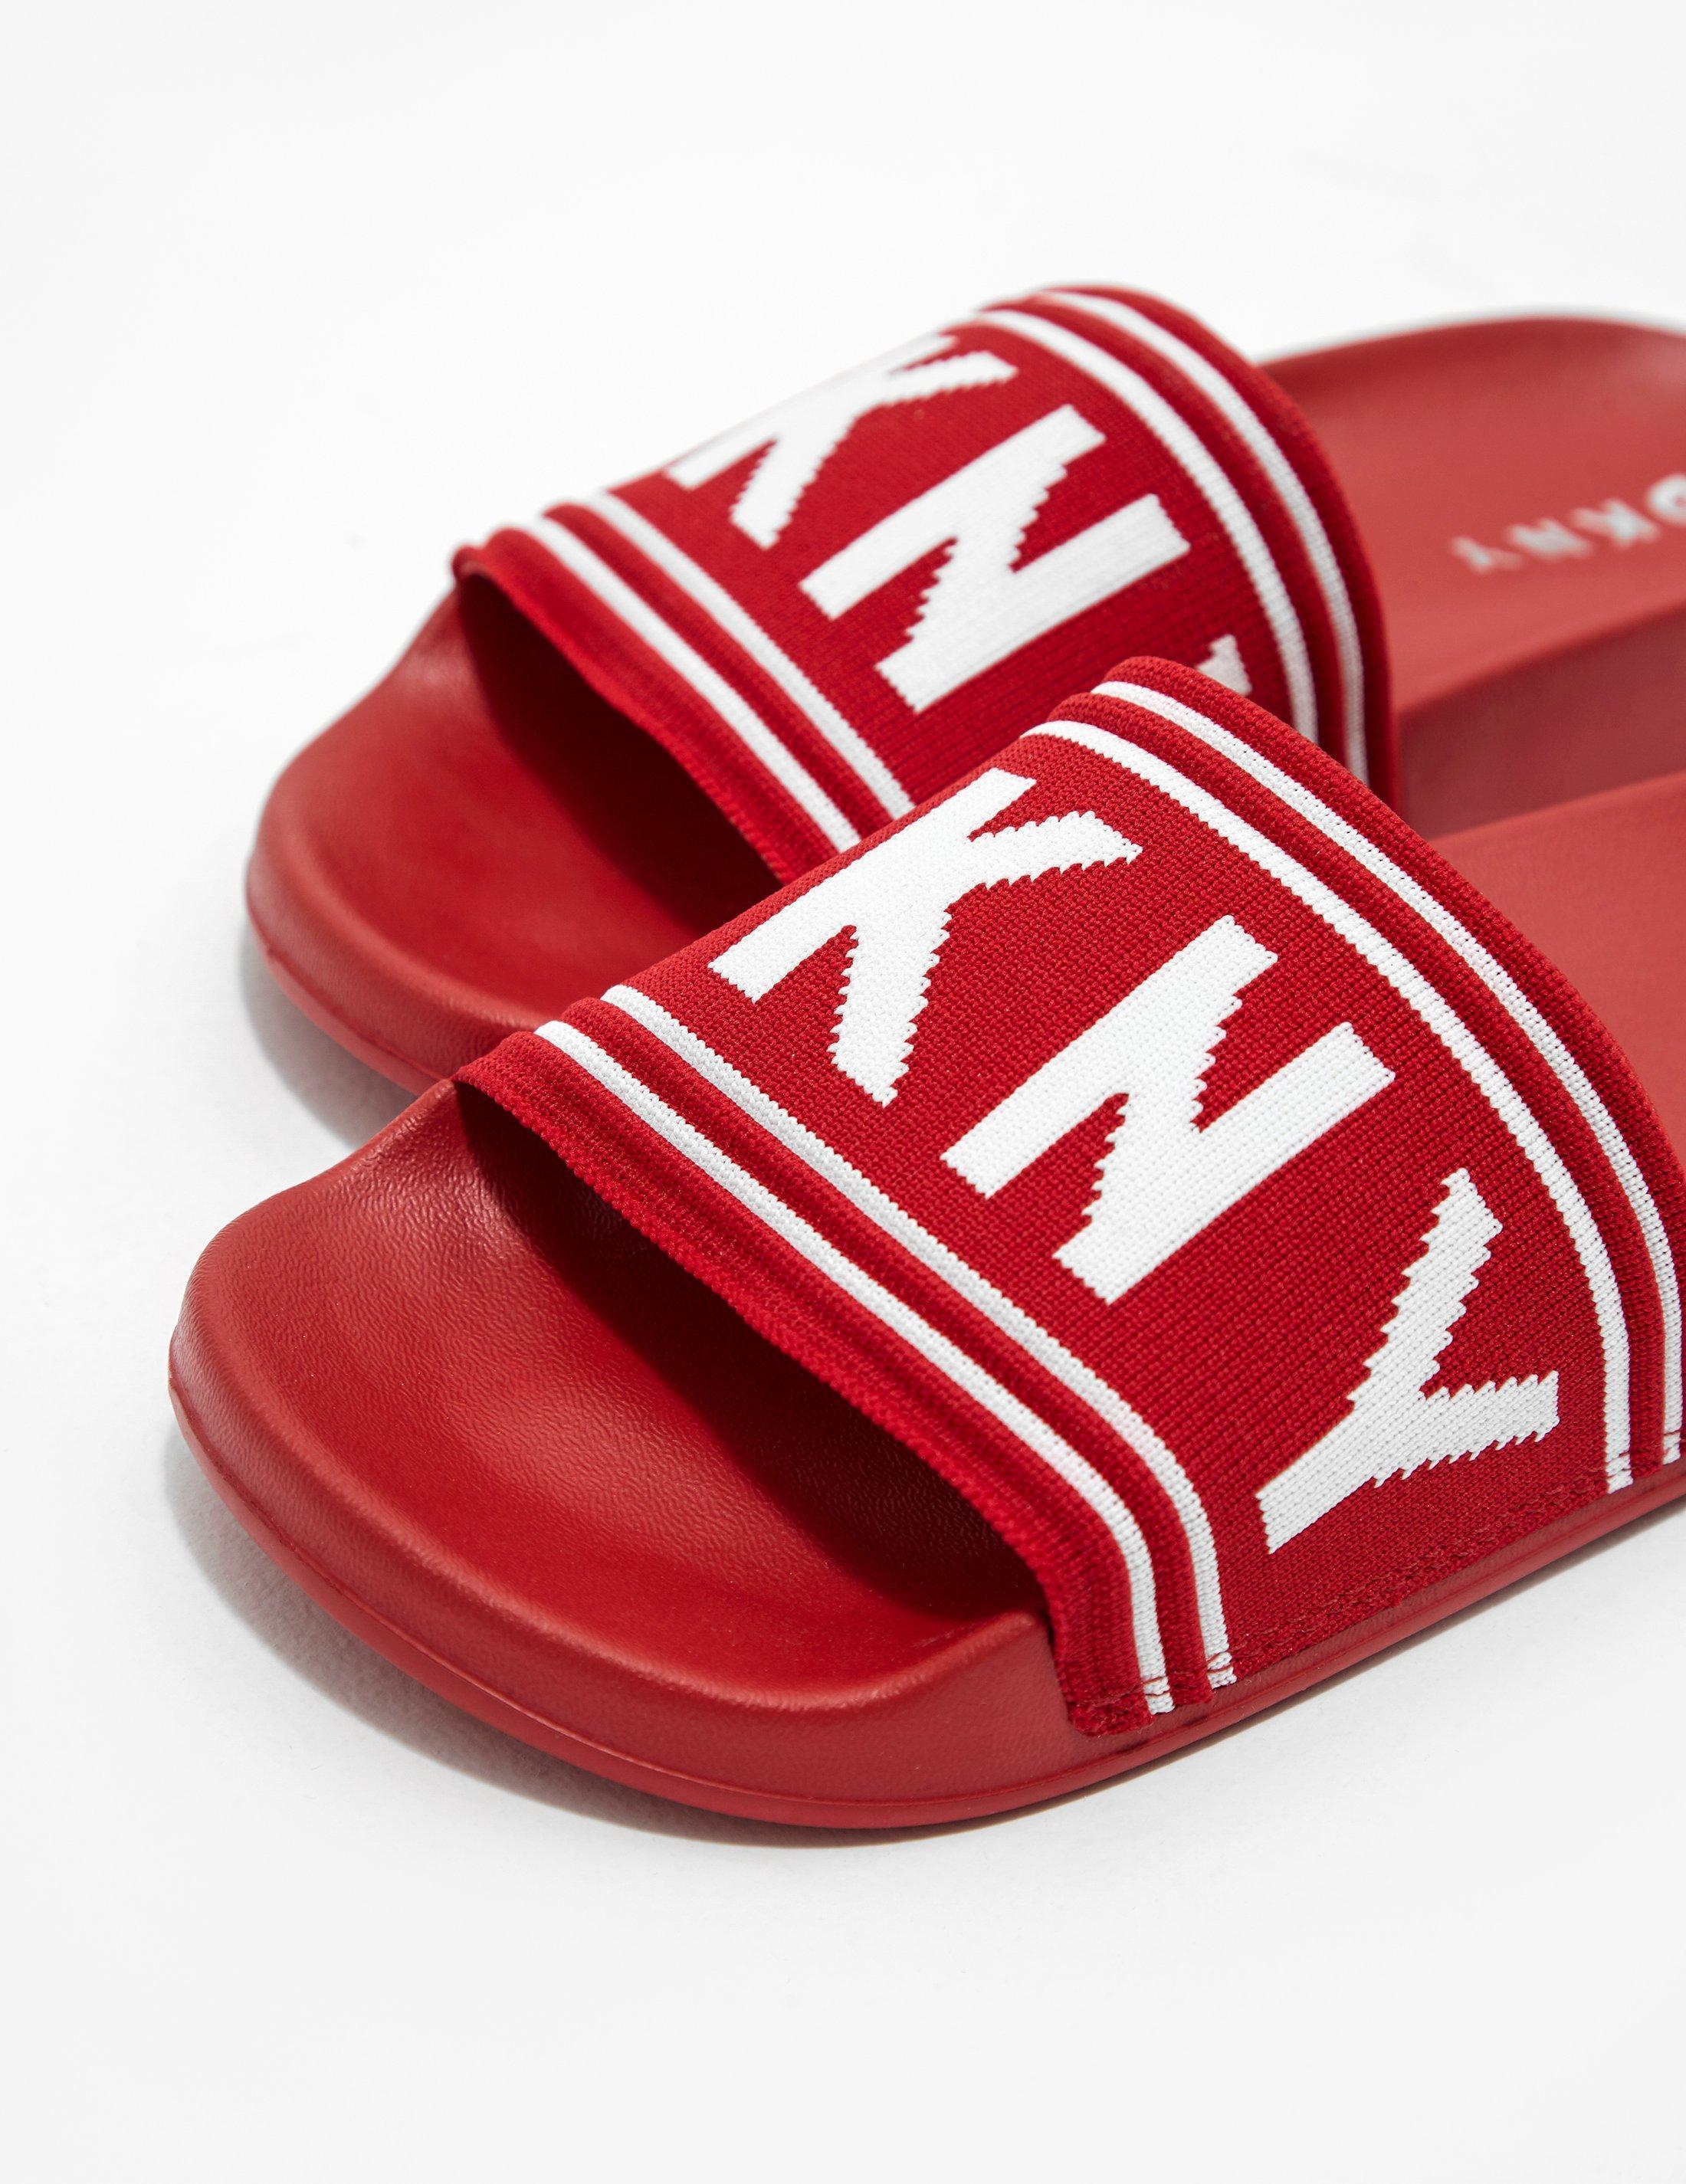 DKNY Rubber Zora Slides Red - Lyst